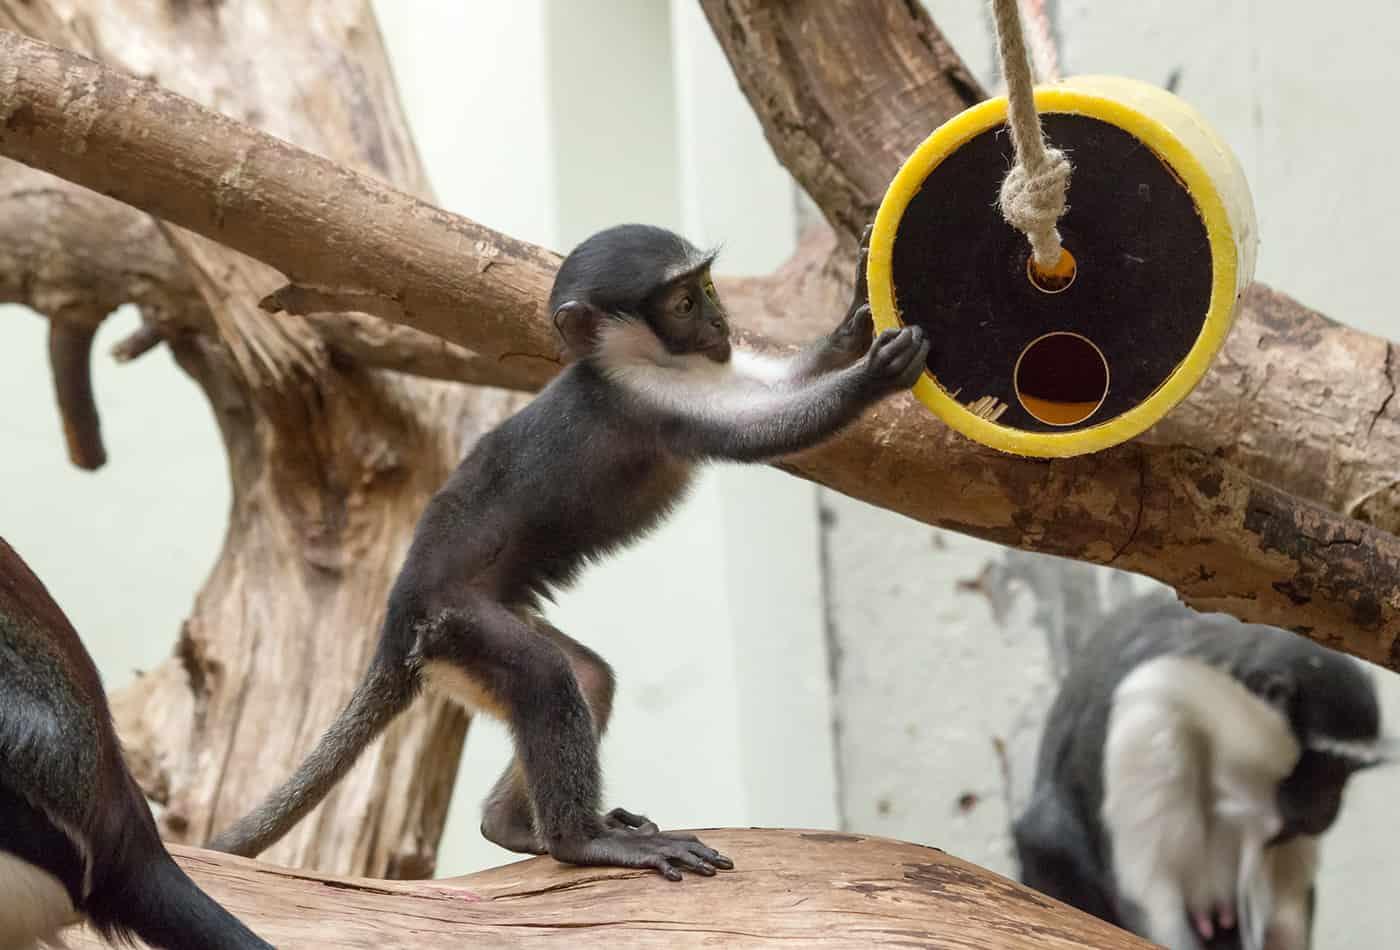 artenschutztag im zoo zoo heidelberg leben live erleben. Black Bedroom Furniture Sets. Home Design Ideas